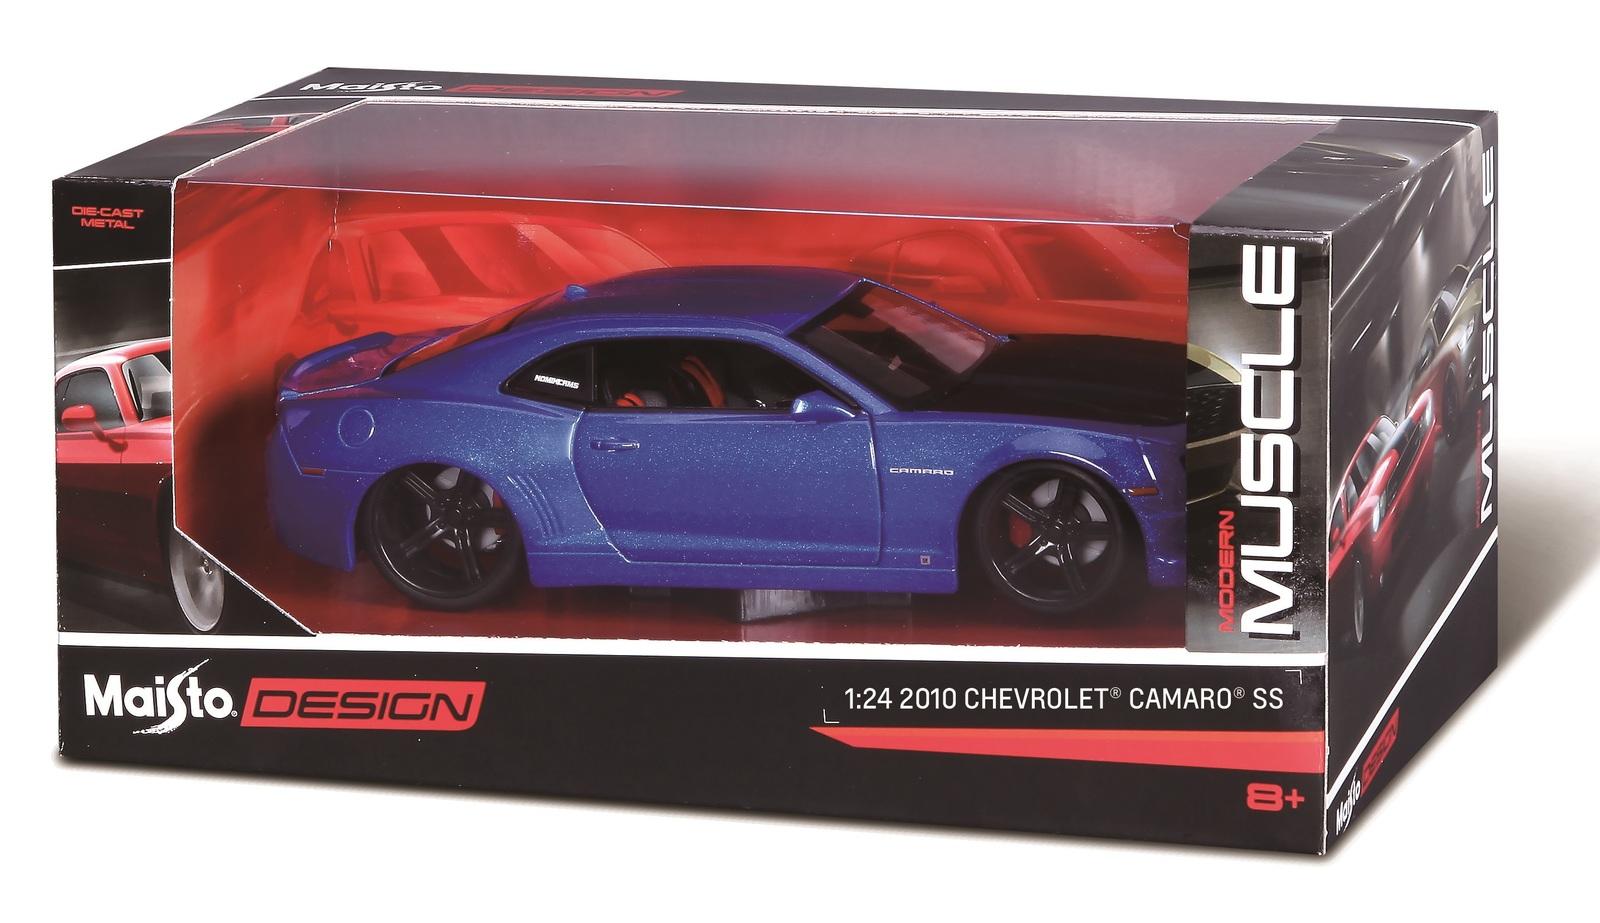 Maisto: 1:24 Die-Cast Vehicle - 2010 Chevrolet Camaro SS image